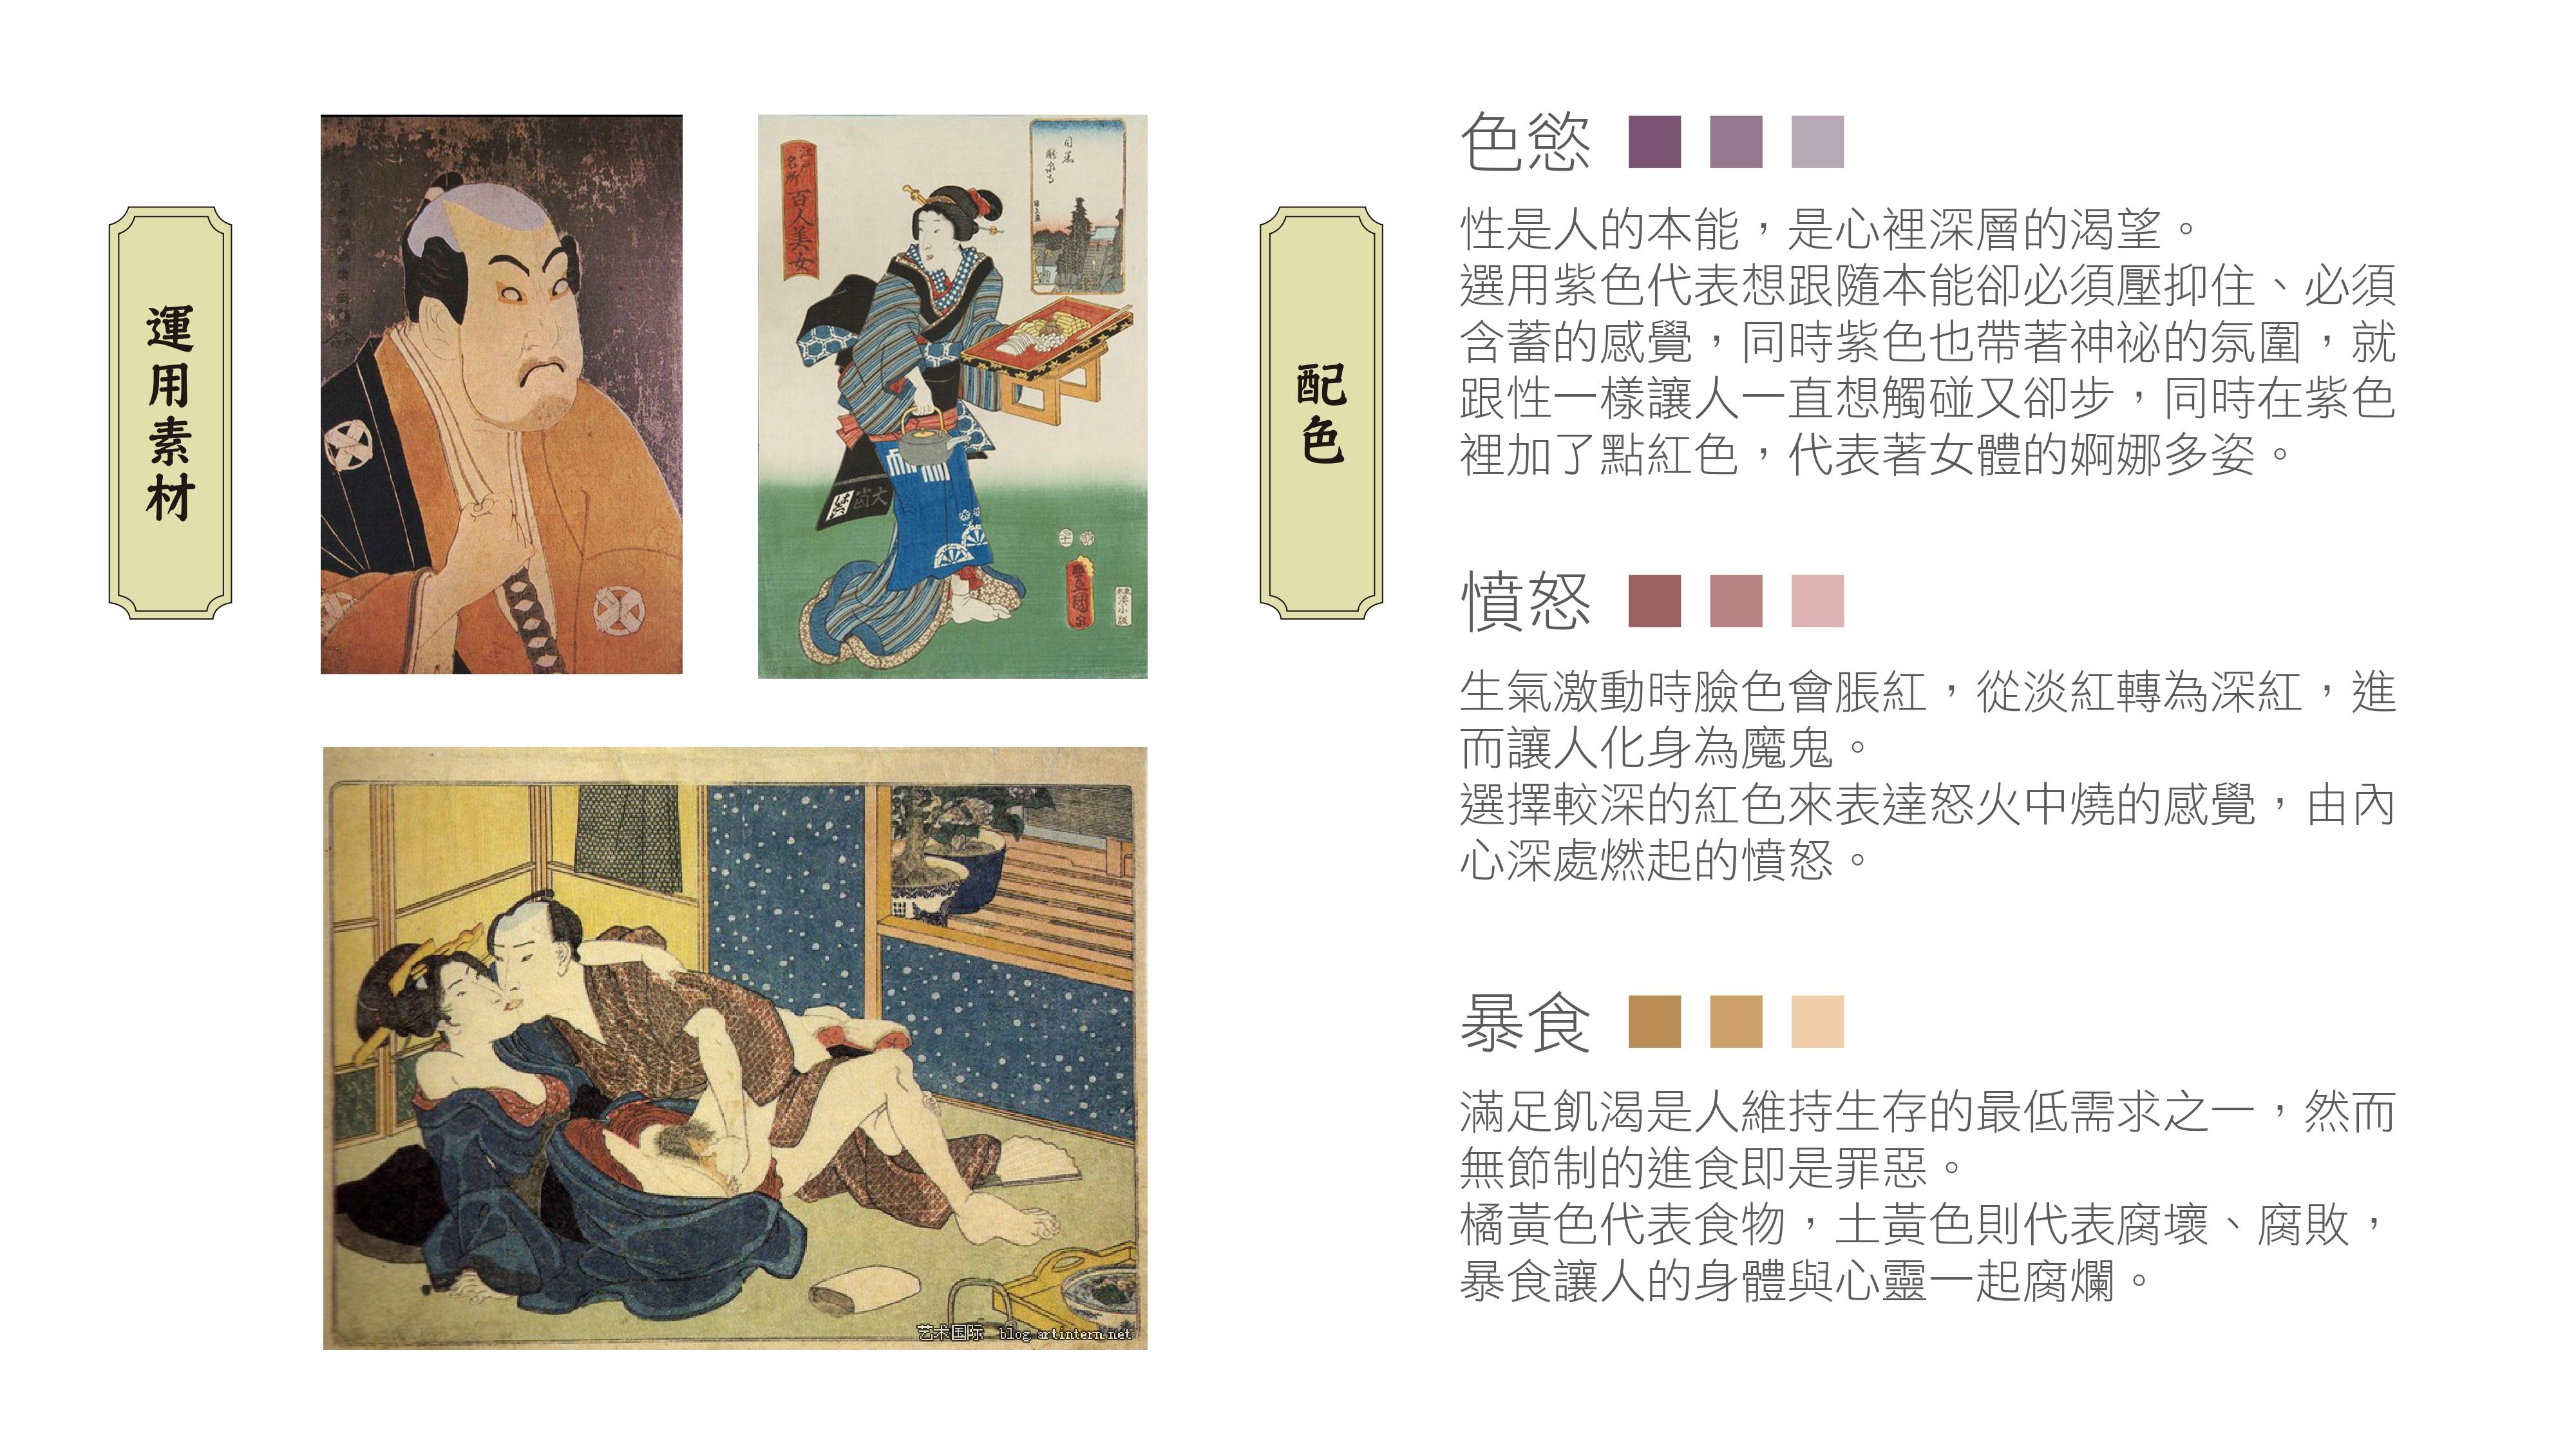 七宗罪_pages-to-jpg-0004